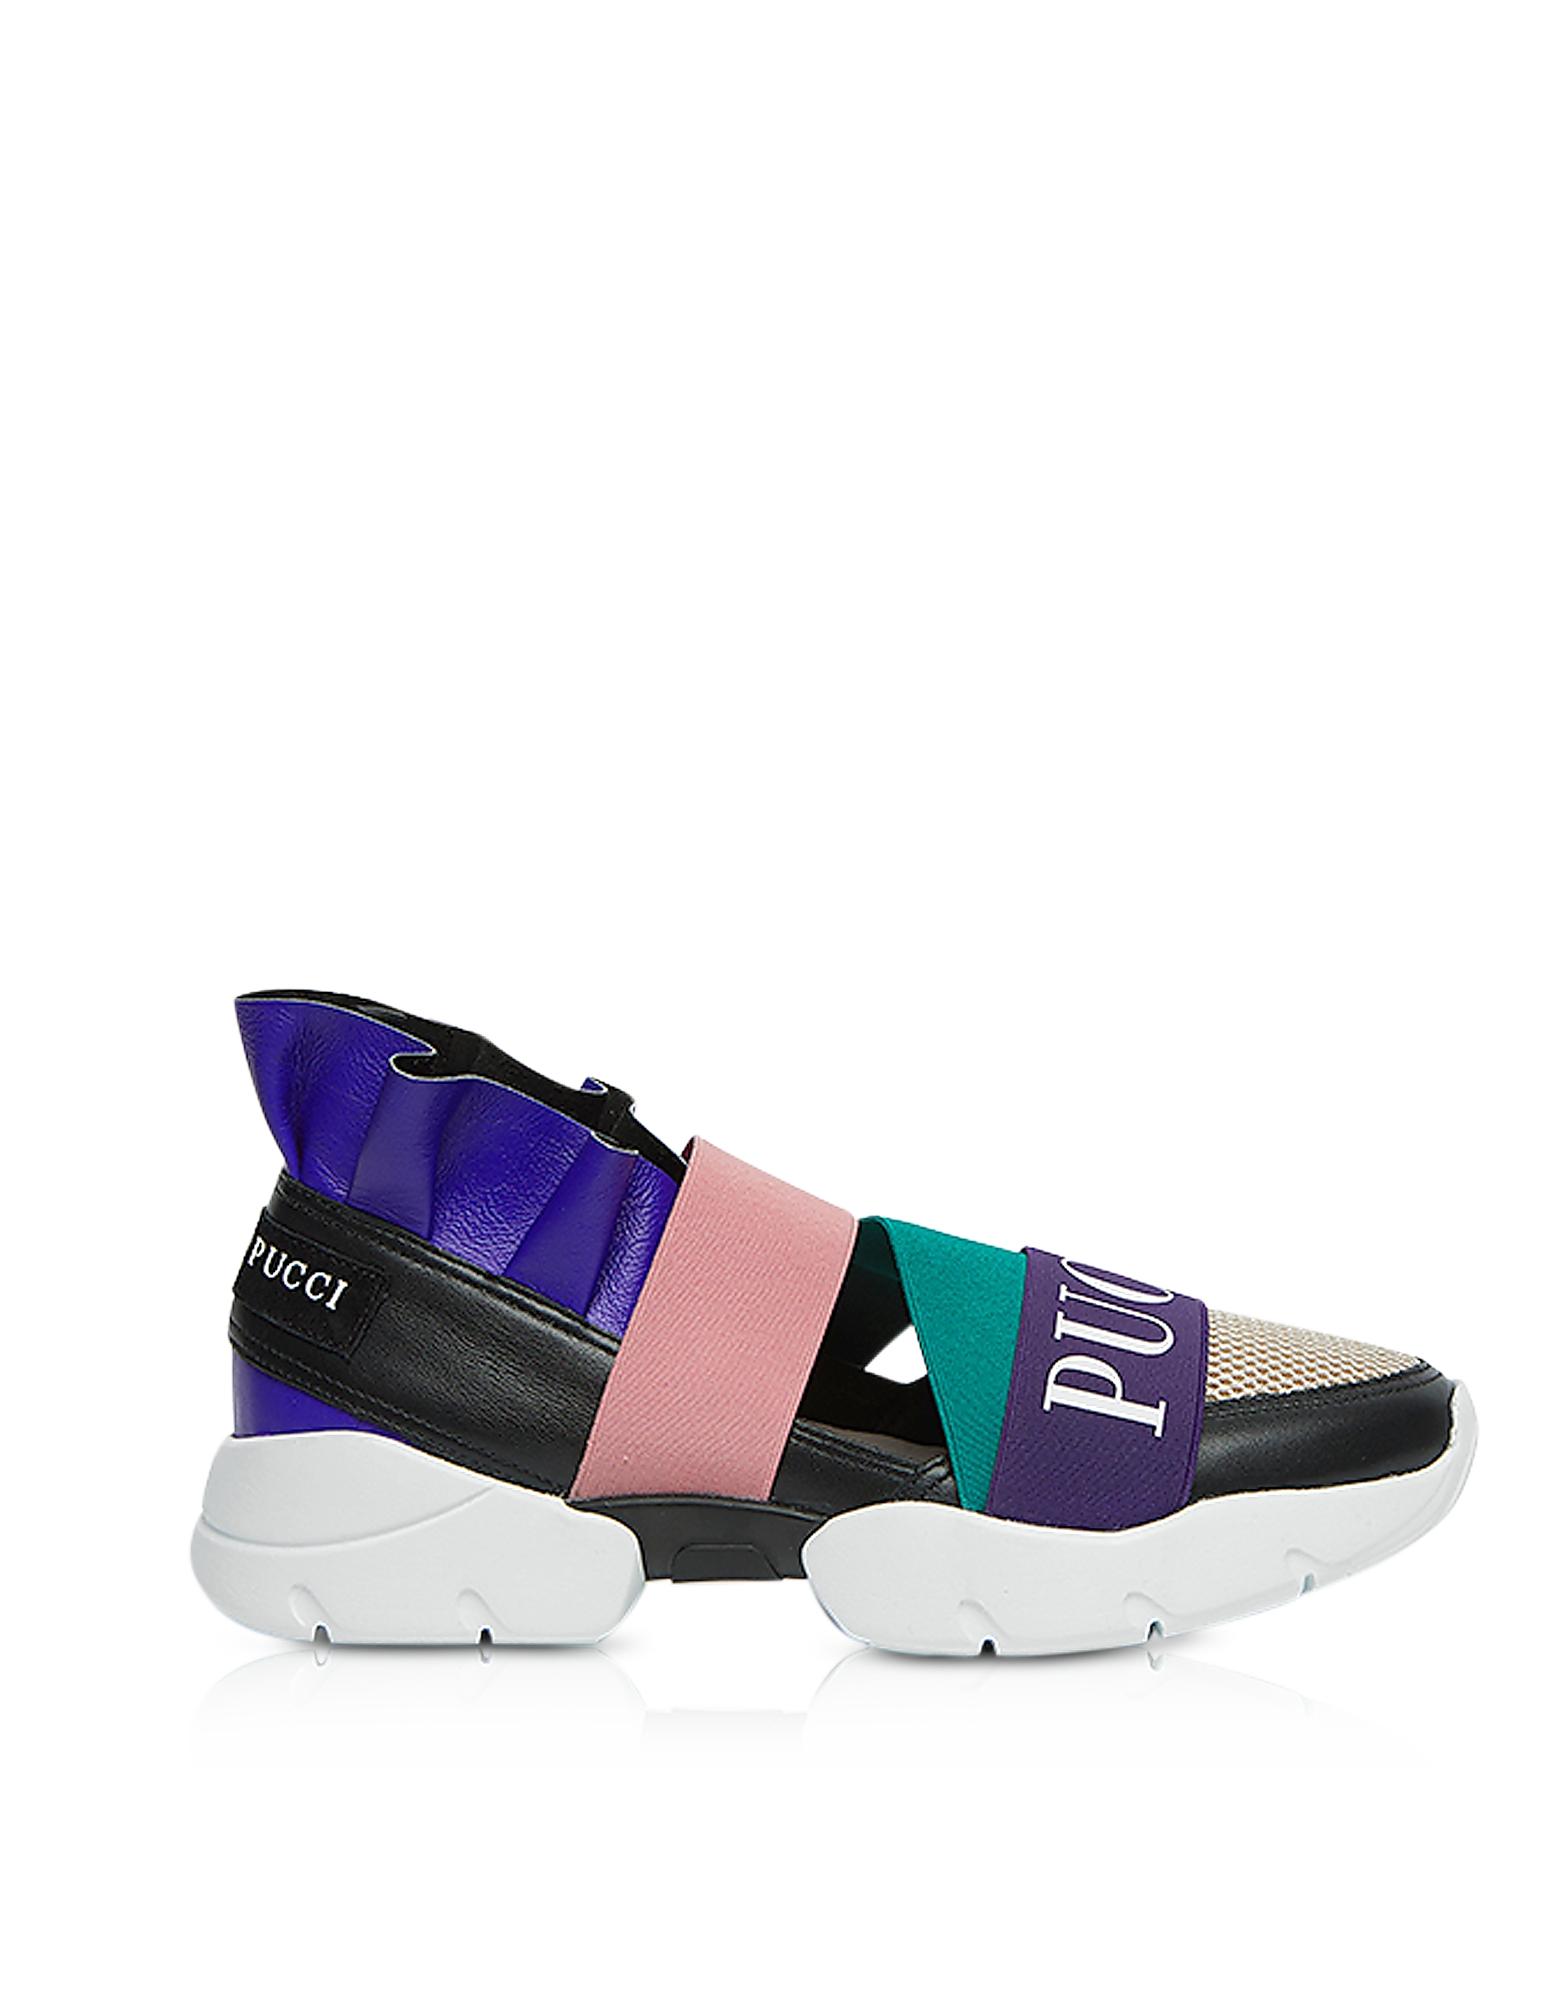 City Up Black Nylon Signature Sneakers